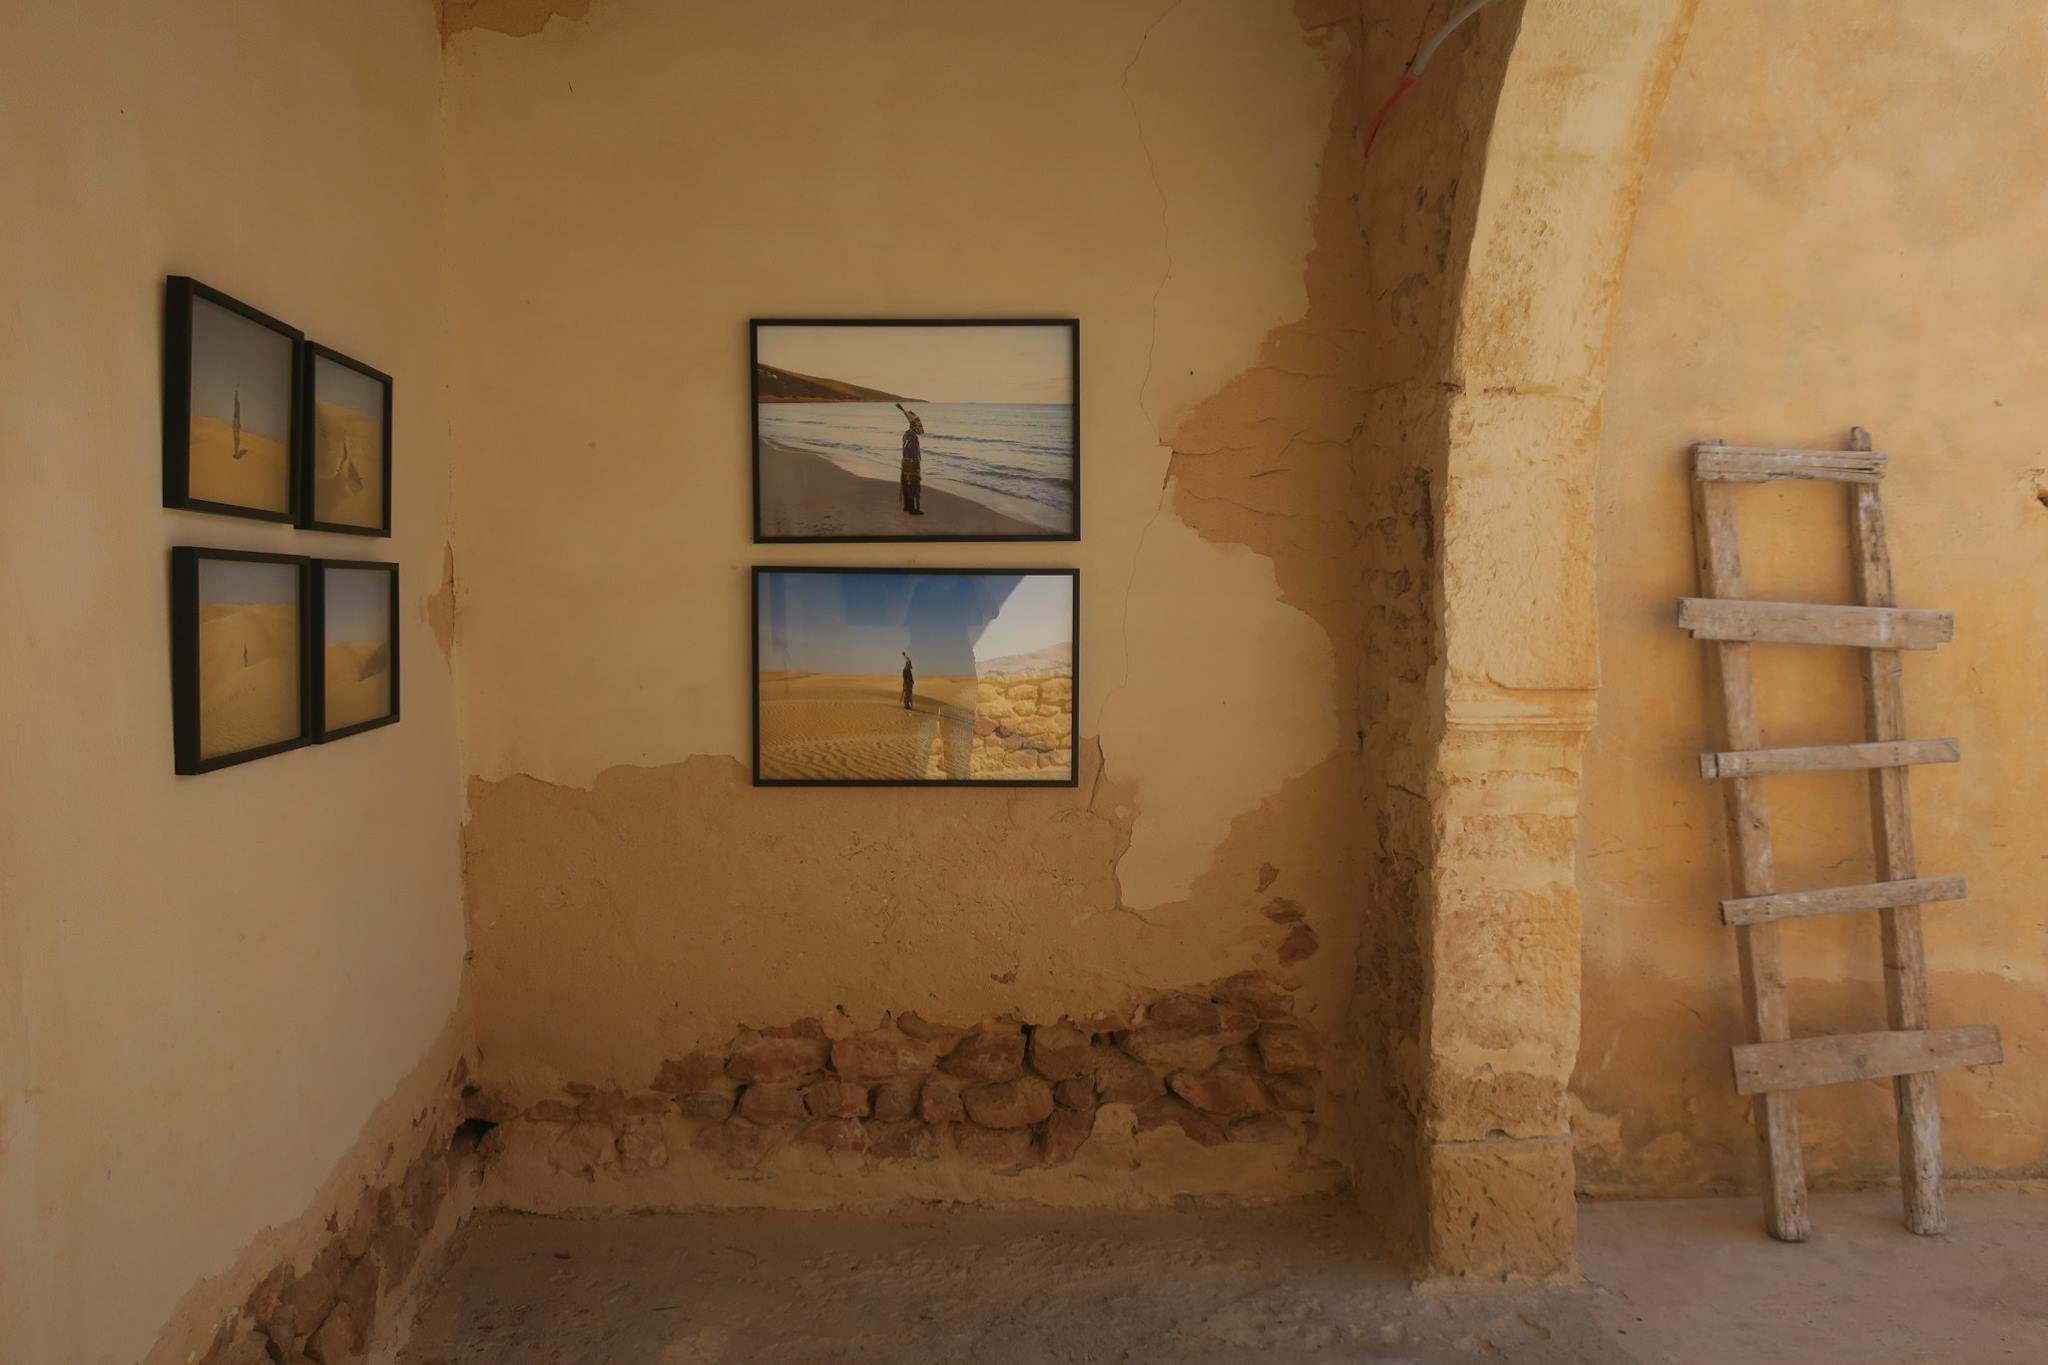 """Looking for Saadiya"". Kerkennah#1, Festival International de photographie et Art visuel. Lieux de nul part/ Galerie Ghaya / juin 2018 Kerkennah. Tunisie"